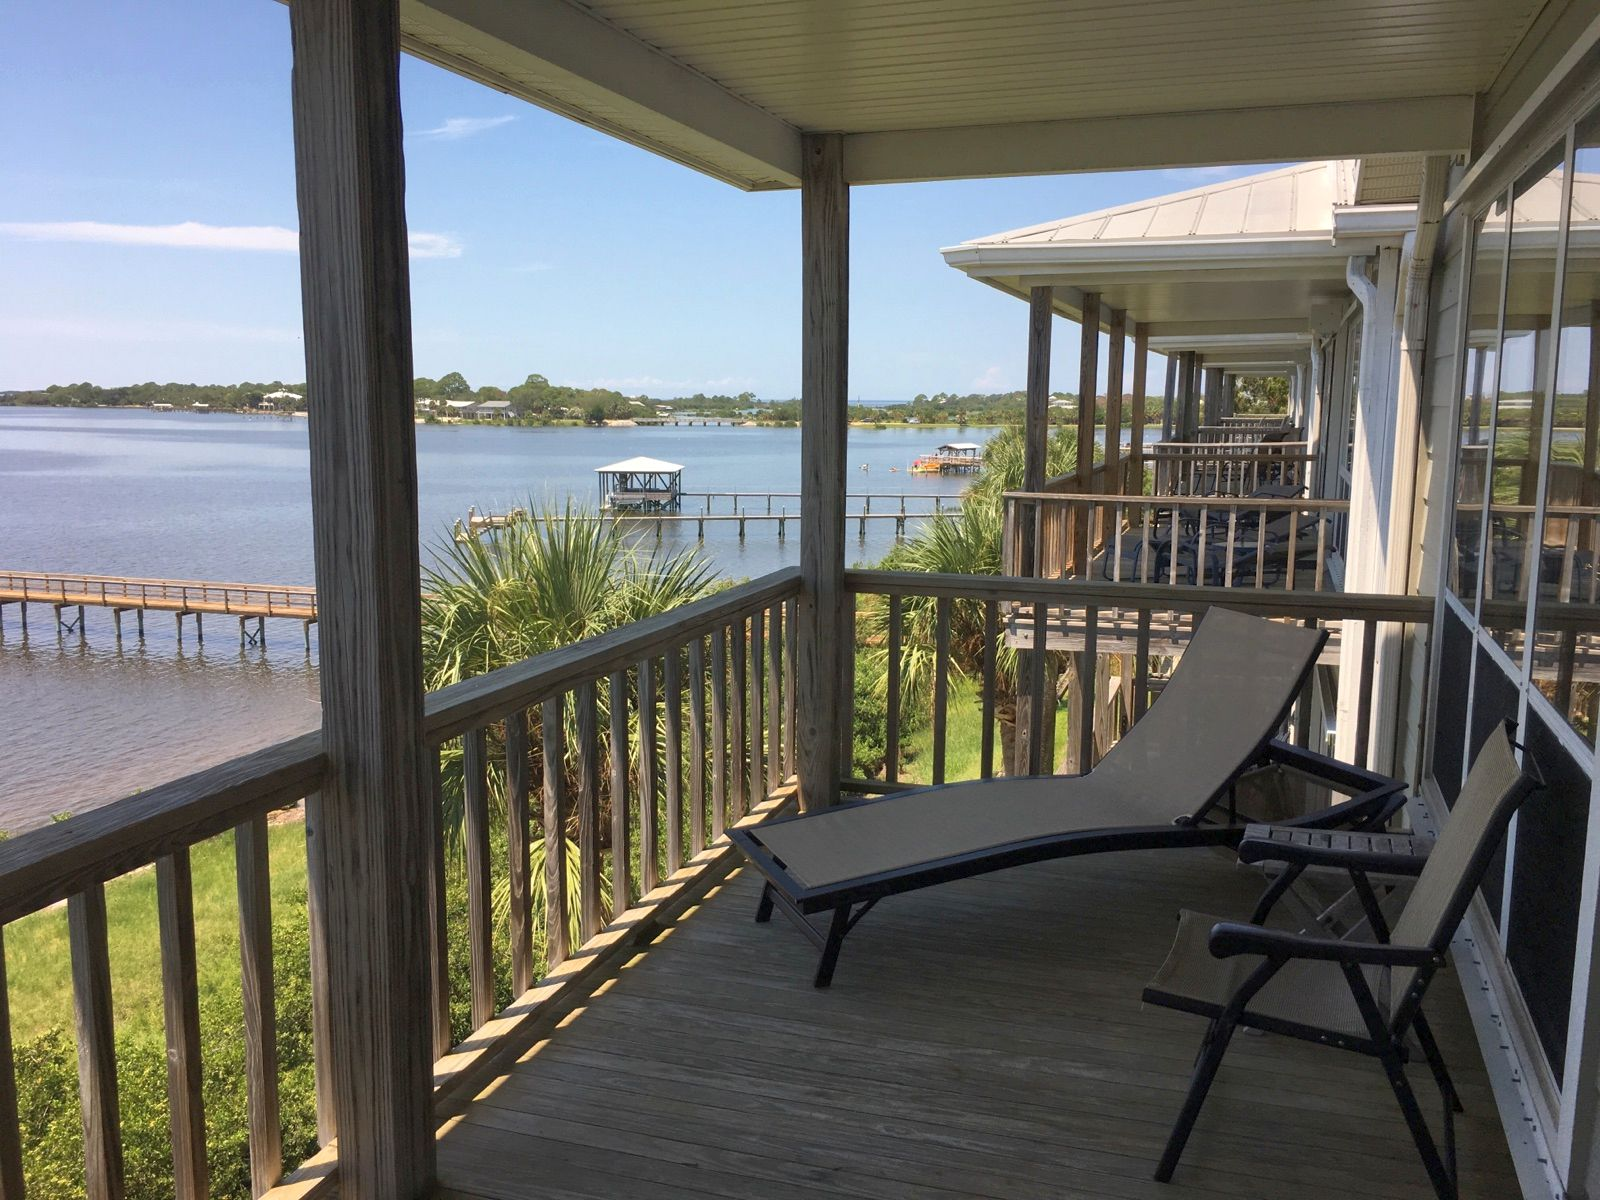 Gulf Front Condominium Rentals in Cedar Key FL